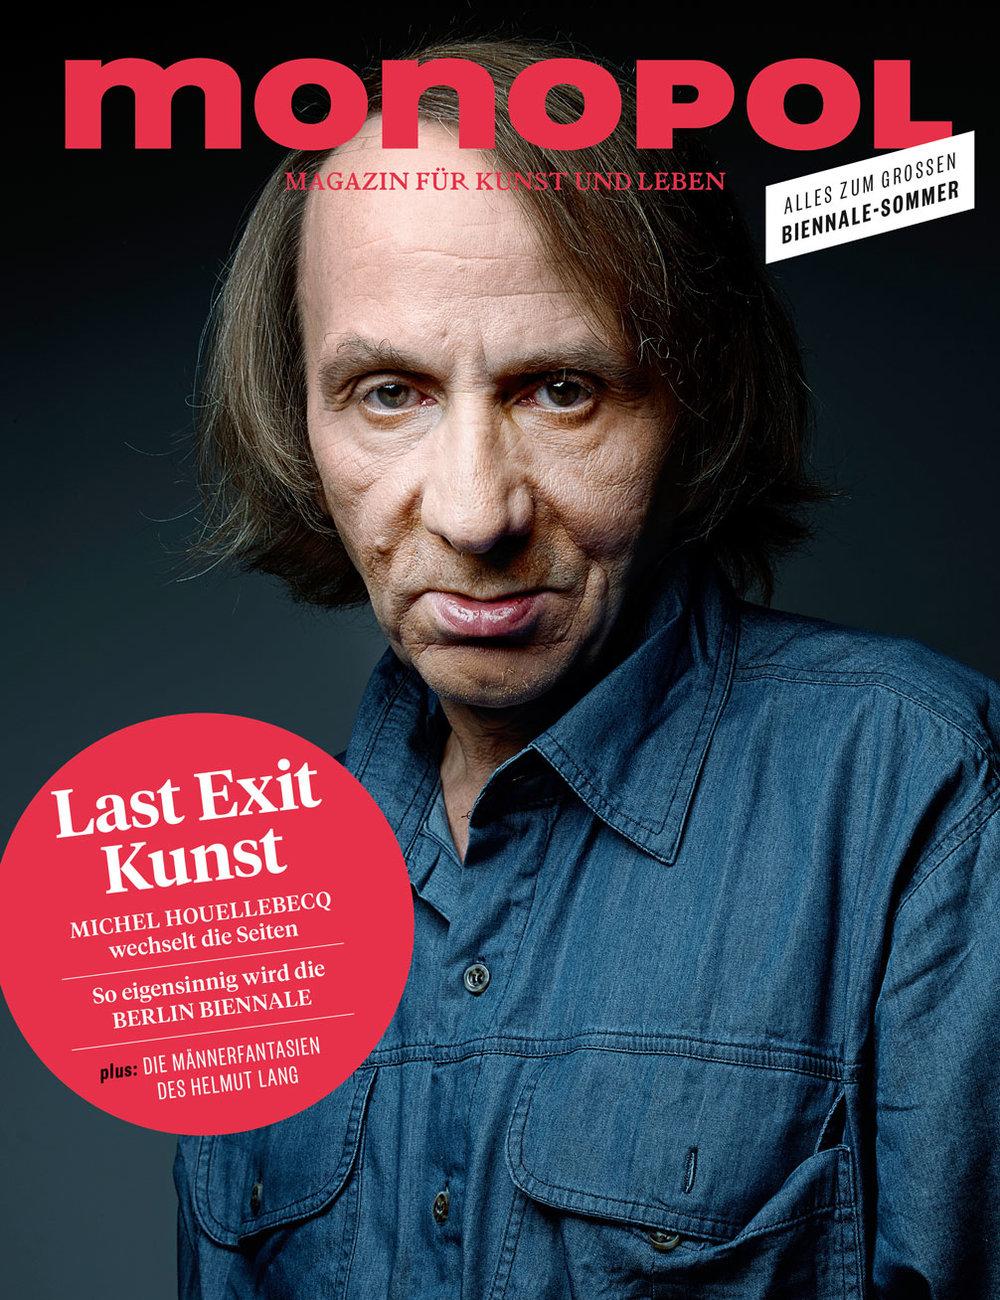 Monopol Magazin , Art Basel supplement, June 2016   Editing